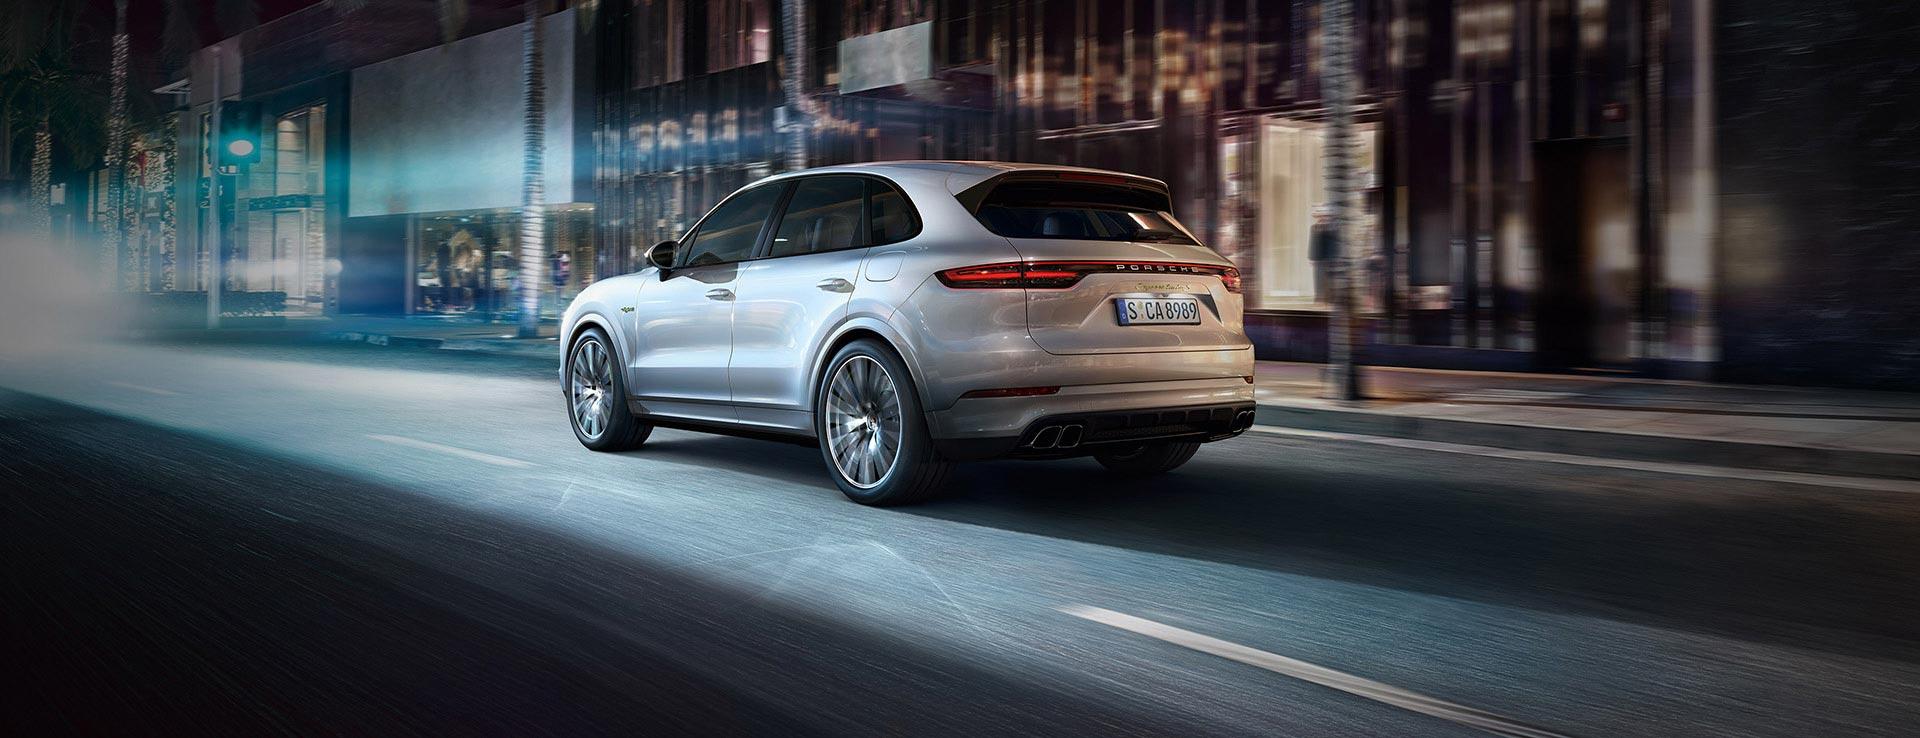 Porsche Türkiye - Sportif Araç Deneyimi tout Chassis Jardin